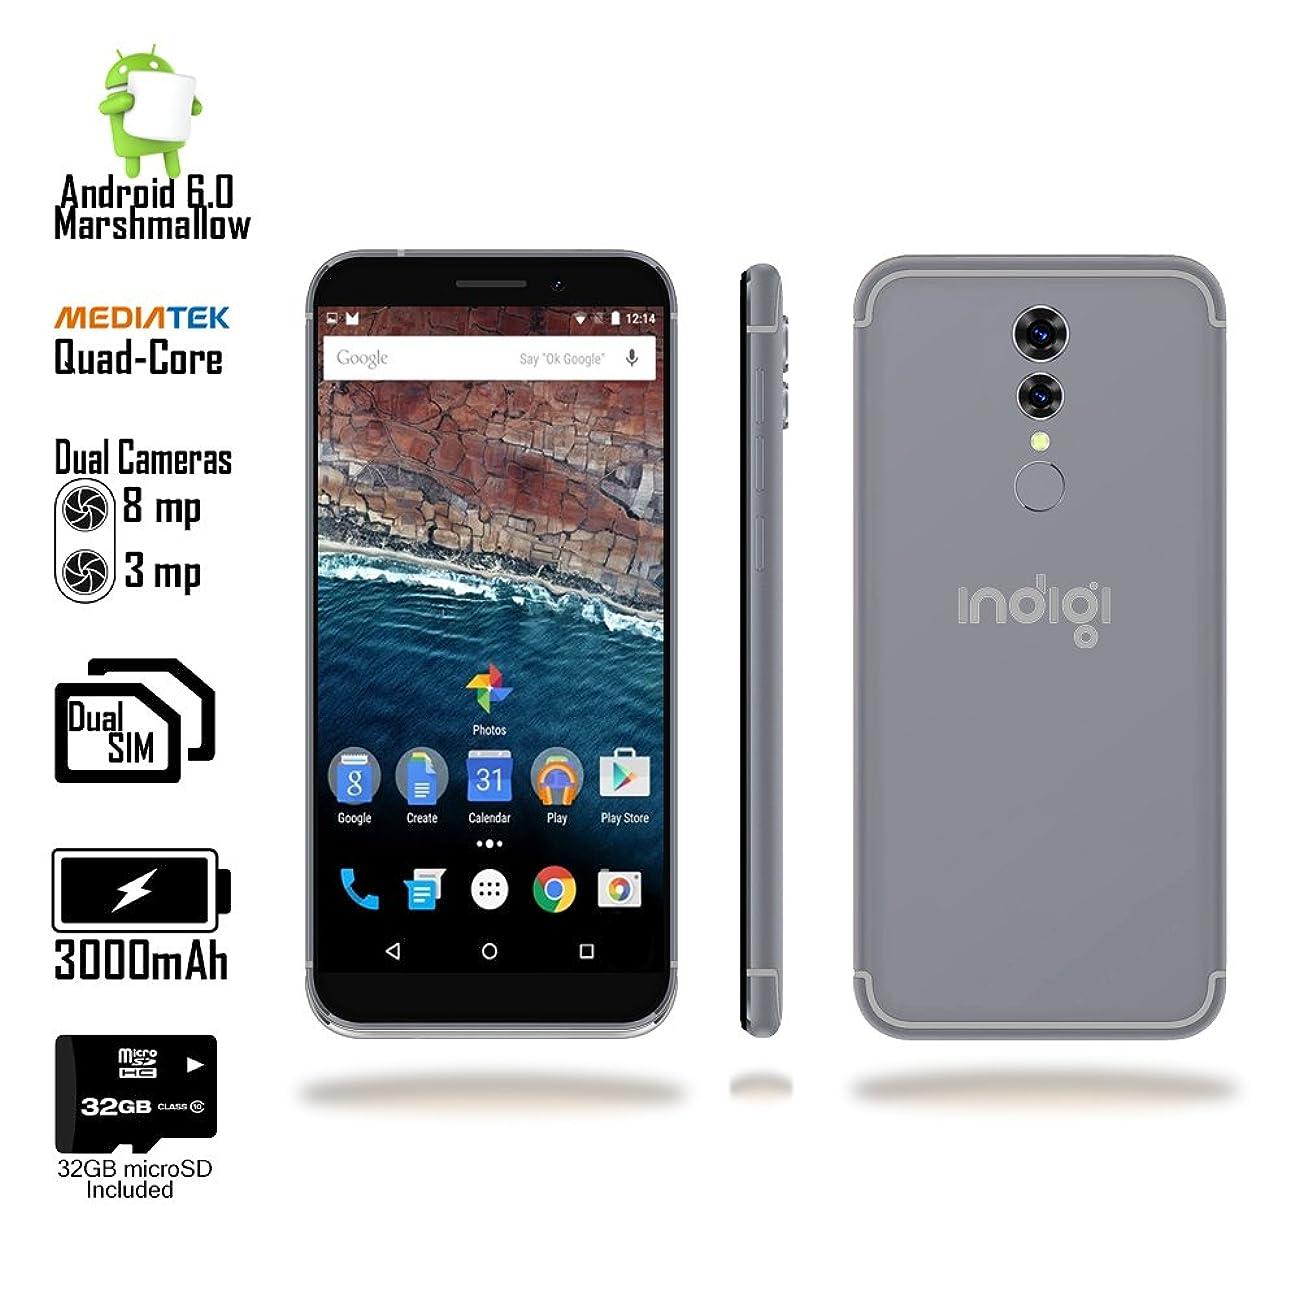 5.6-inch Android Marshmallow SmartPhone (4G LTE GSM Unlocked + QuadCore CPU @ 1.3GHz + 1GB RAM & Fingerprint unlock) Black + 32gb microSD